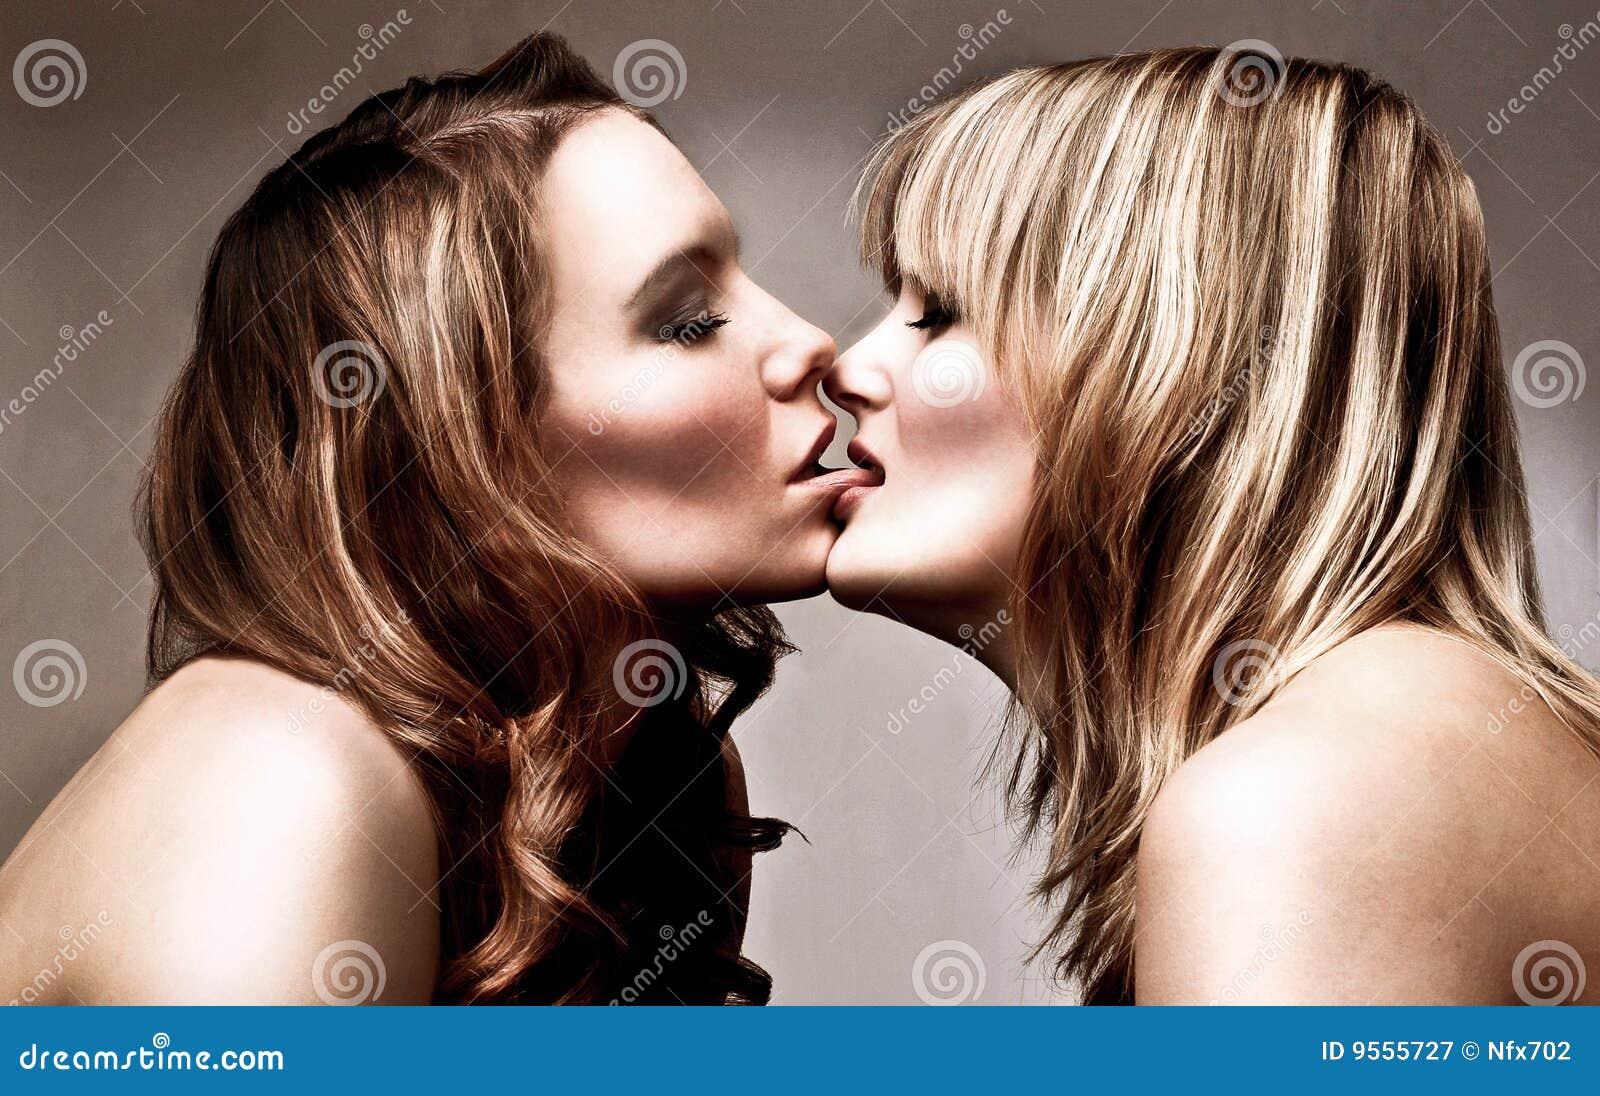 porno de dos mujeres